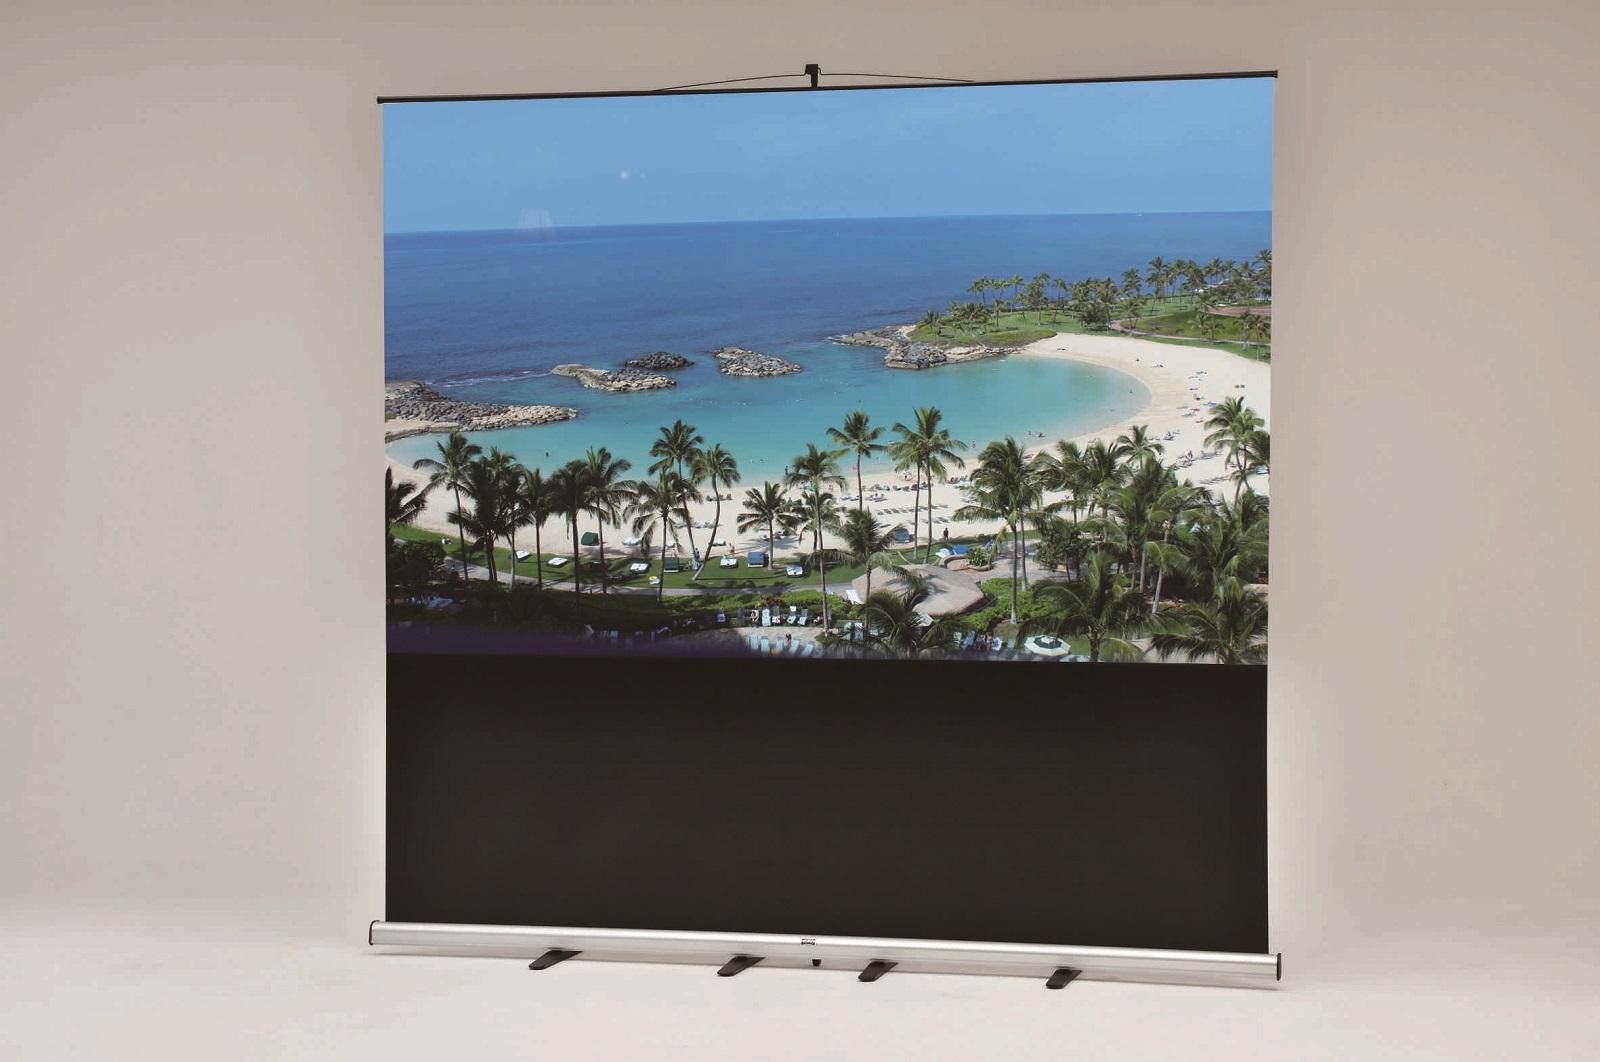 VISPRO モバイルスクリーン 新商品VMR-100  100インチ プロジェクタースクリーン 送料無料